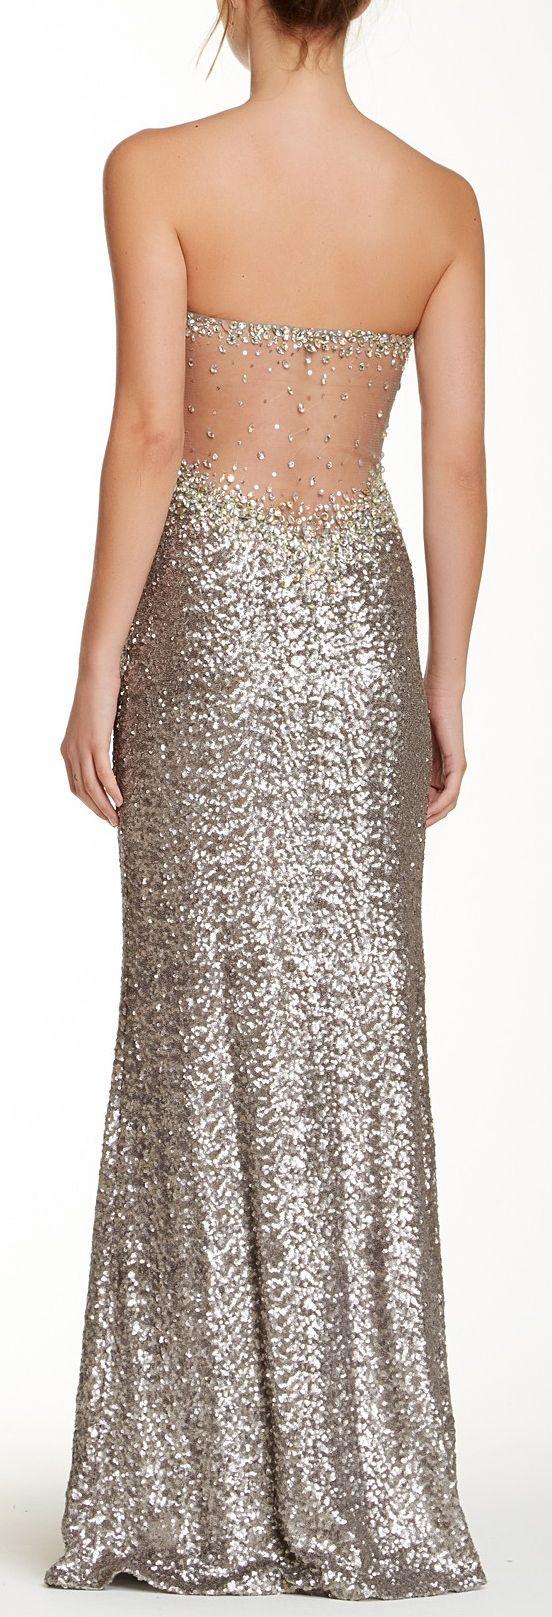 Glitter gown